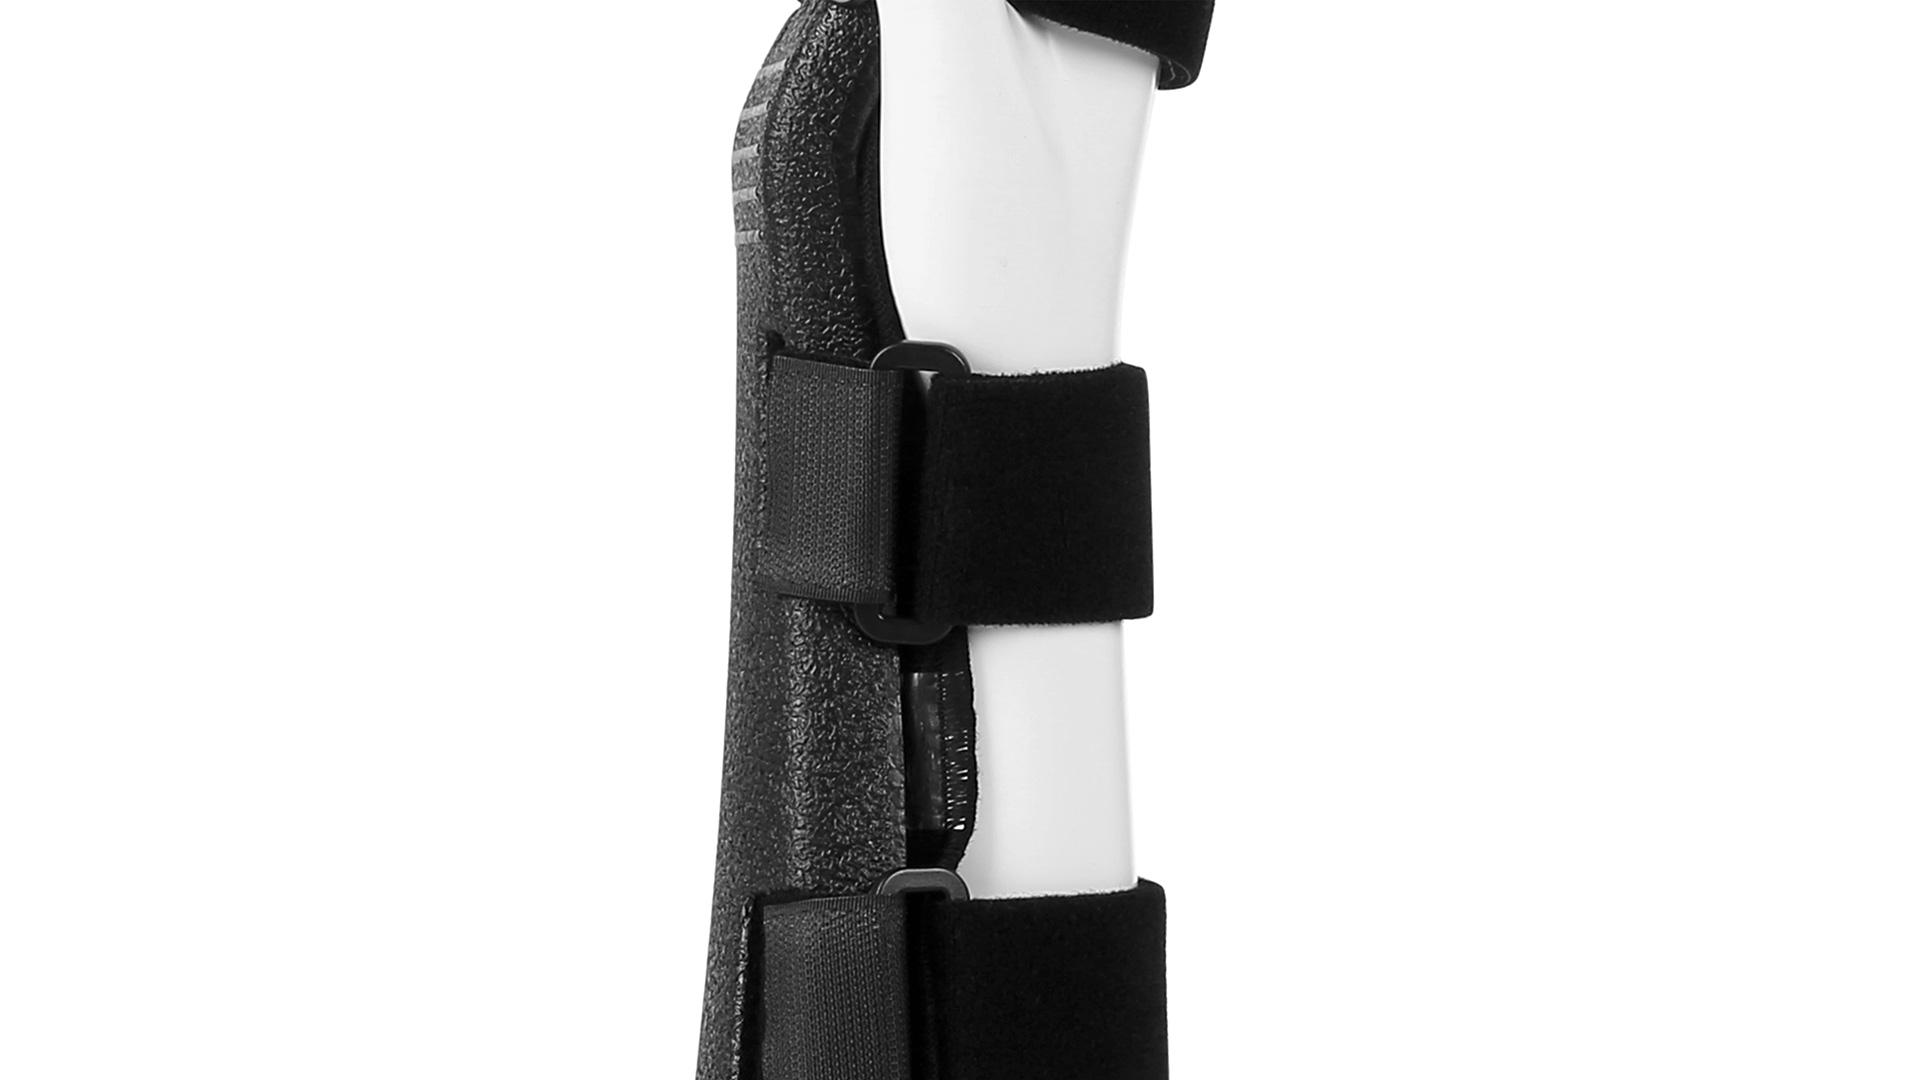 Manu Immobil Pols Hand brace - Type 50P10